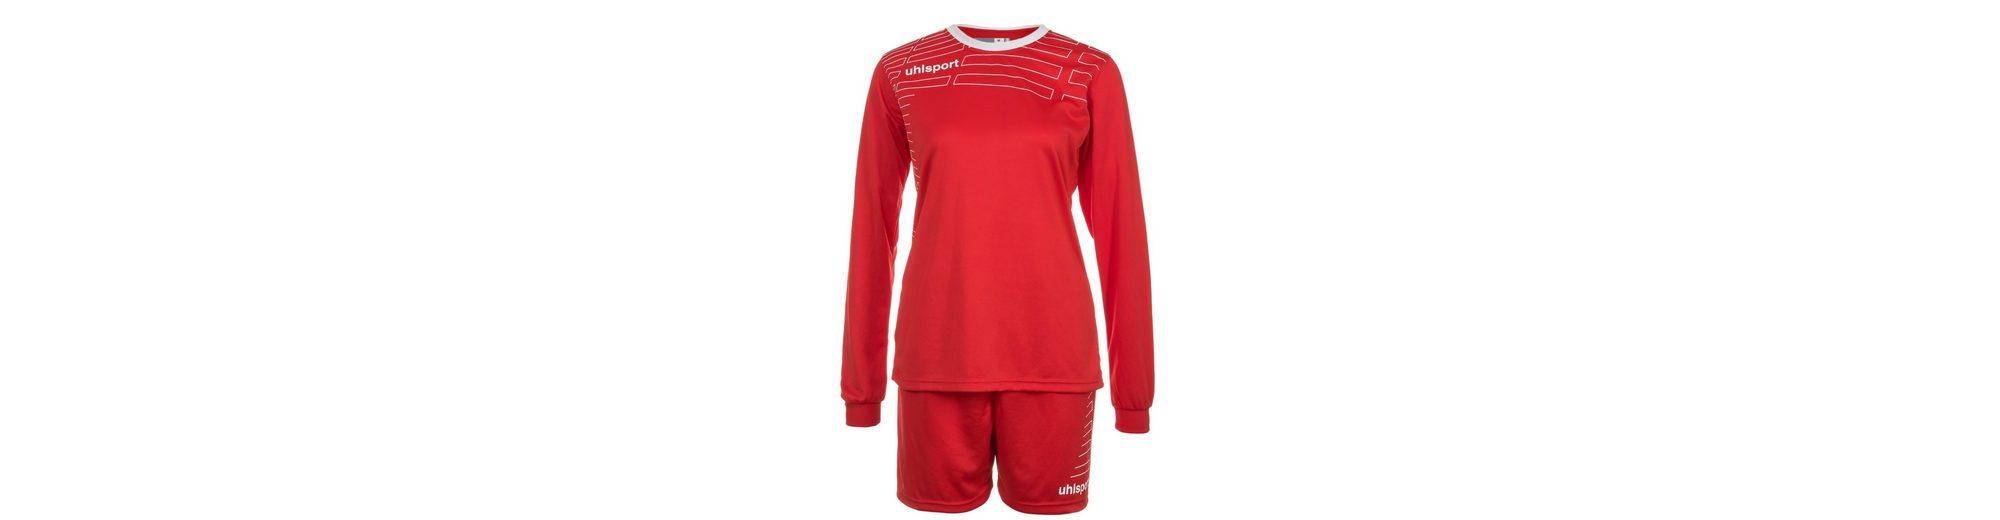 Longsleeve Kit Team Damen Match Kit Longsleeve Match Team UHLSPORT UHLSPORT dv7tq